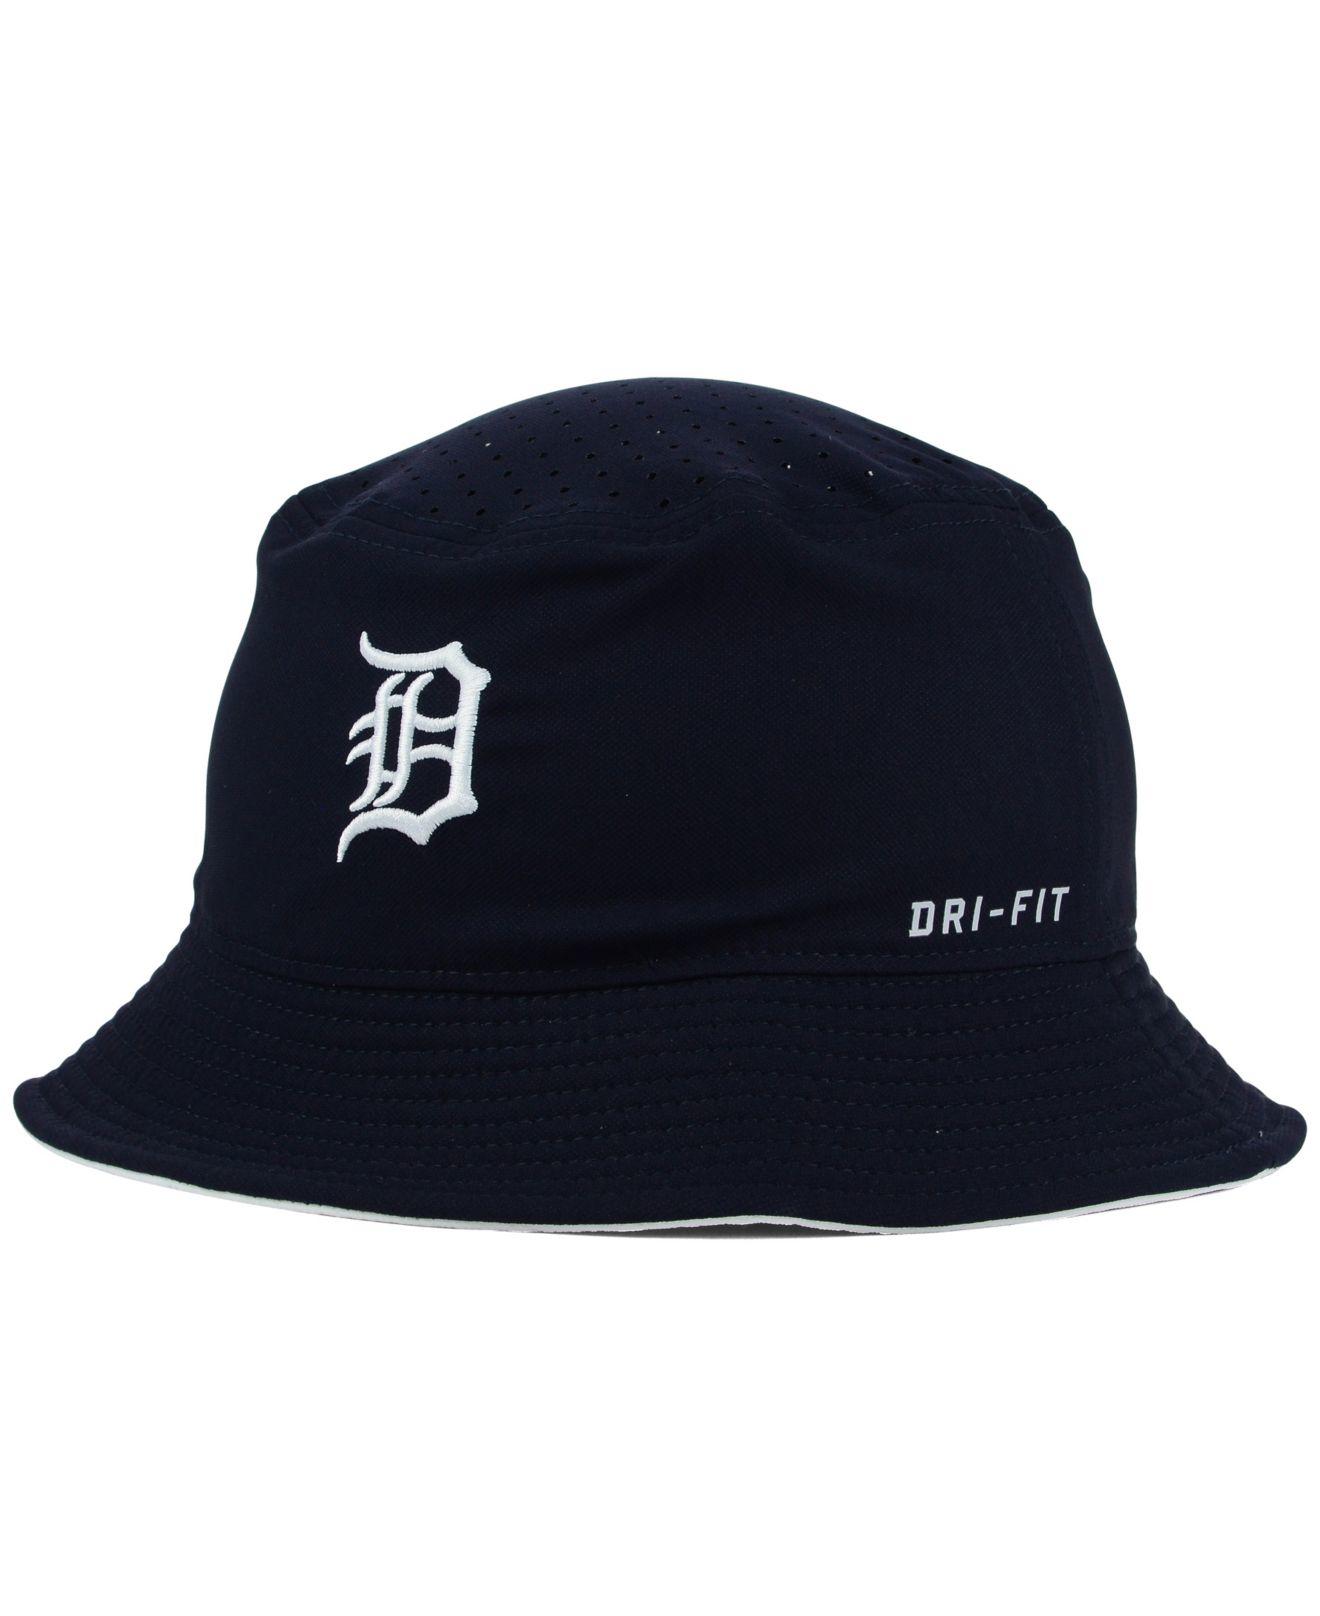 8230ae61de6 ... best price lyst nike detroit tigers vapor dri fit bucket hat in blue  for men f9cb5